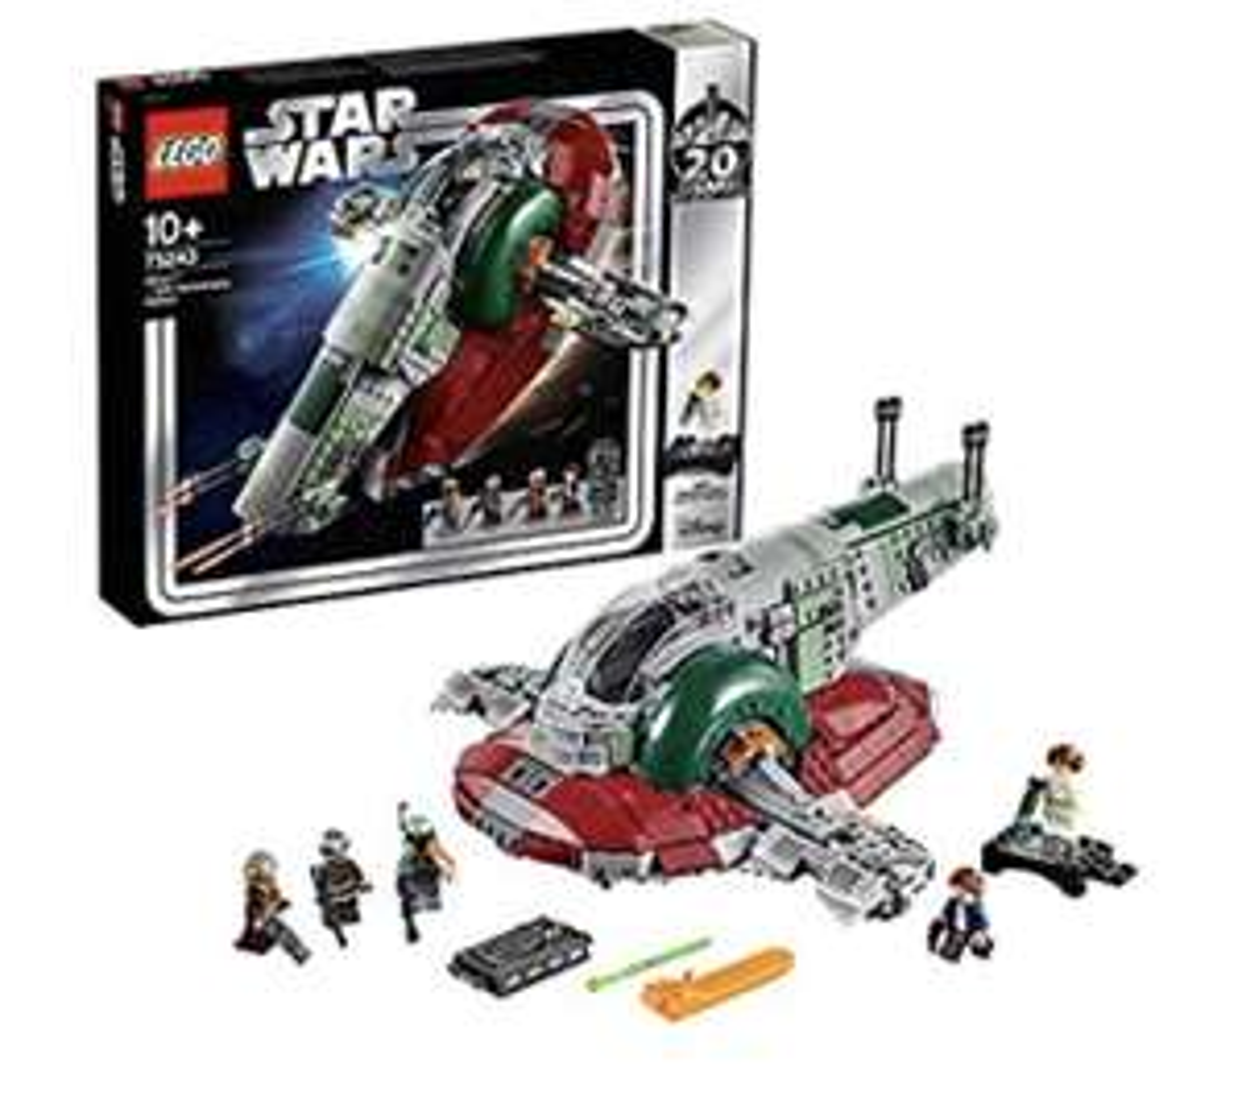 Lego 75243 Star Wars Slave 1 - 20th Anniversary Edition £88 Amazon